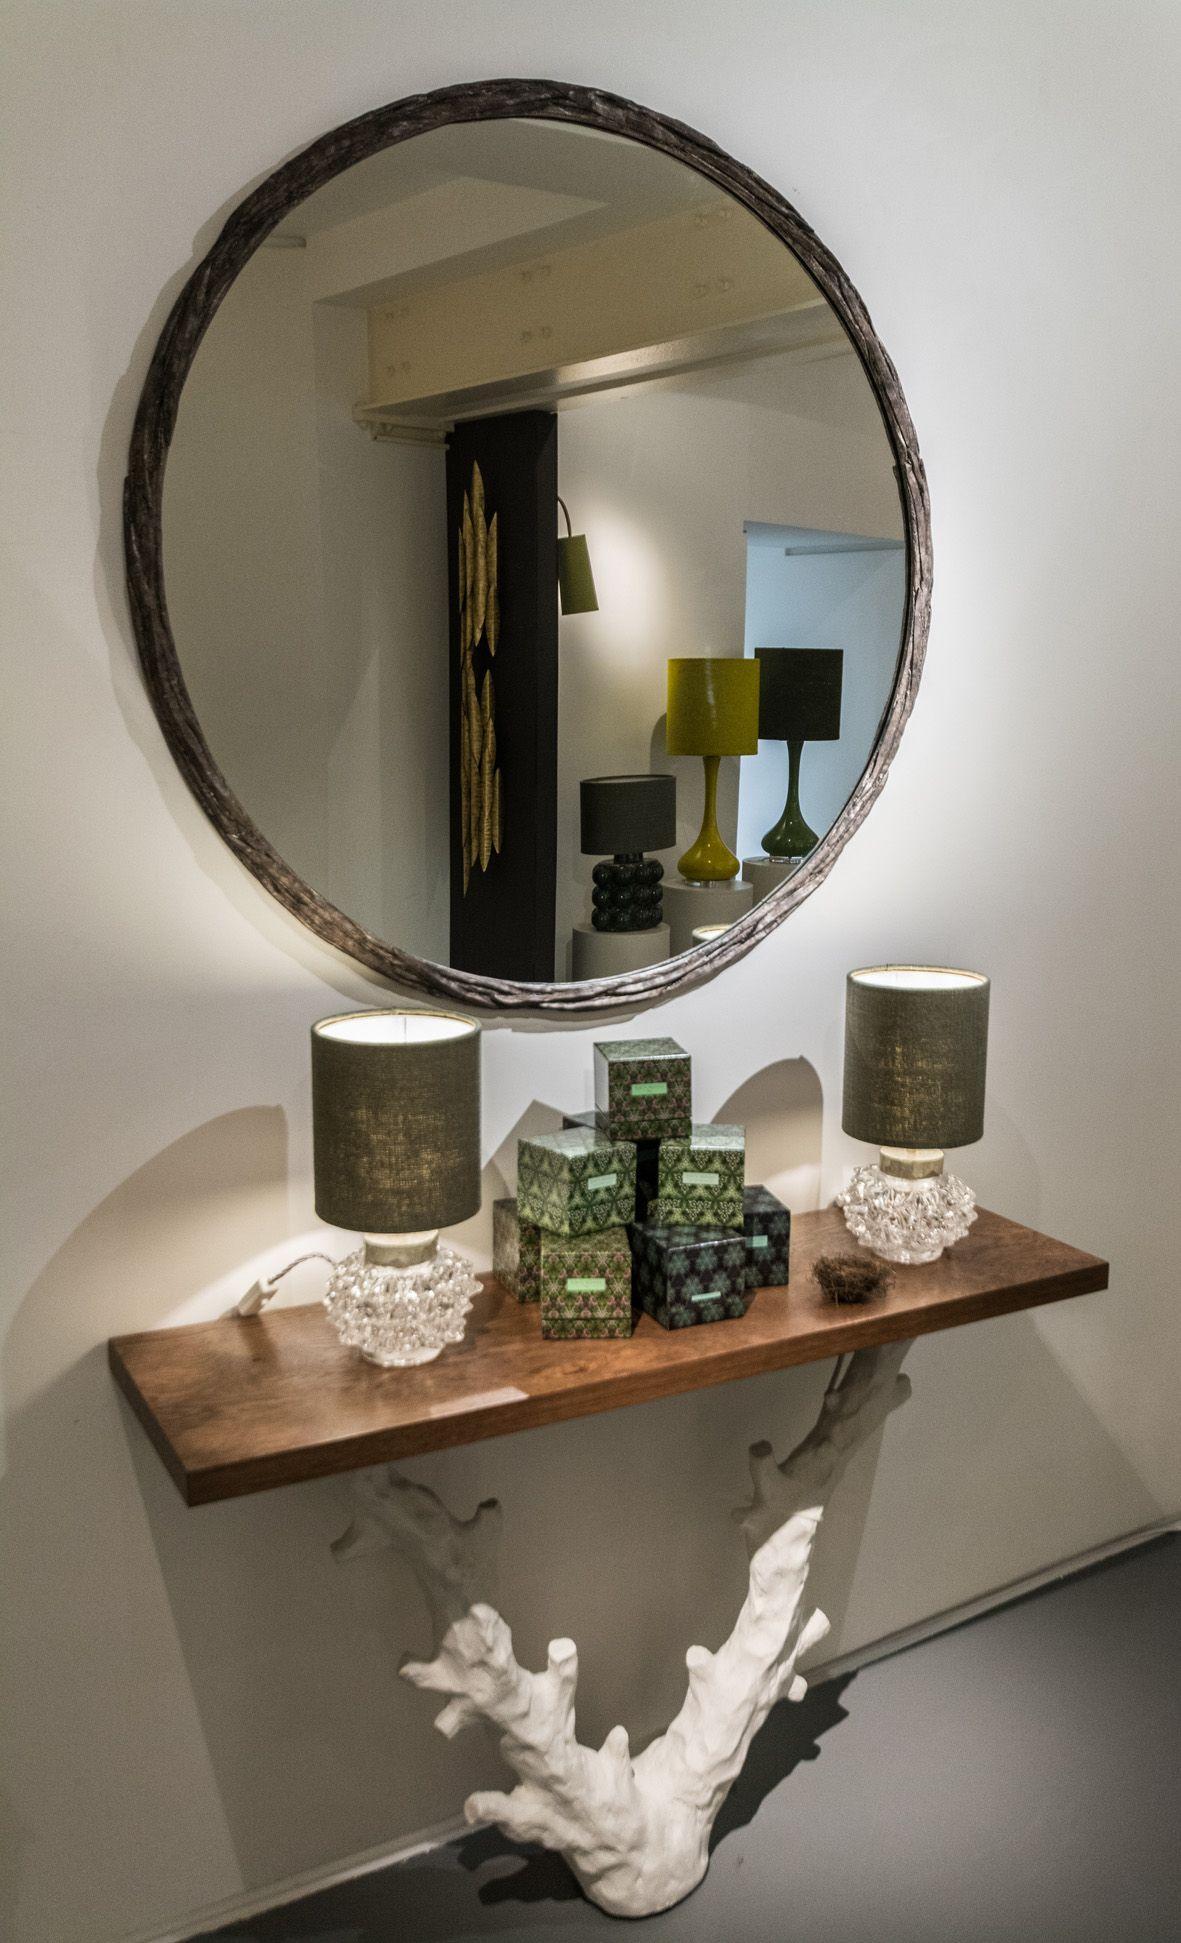 Wonderful Porta Romana | Paris Deco Off 2015 | Hedgehog Lamps | Twig Console Table |  Laurel